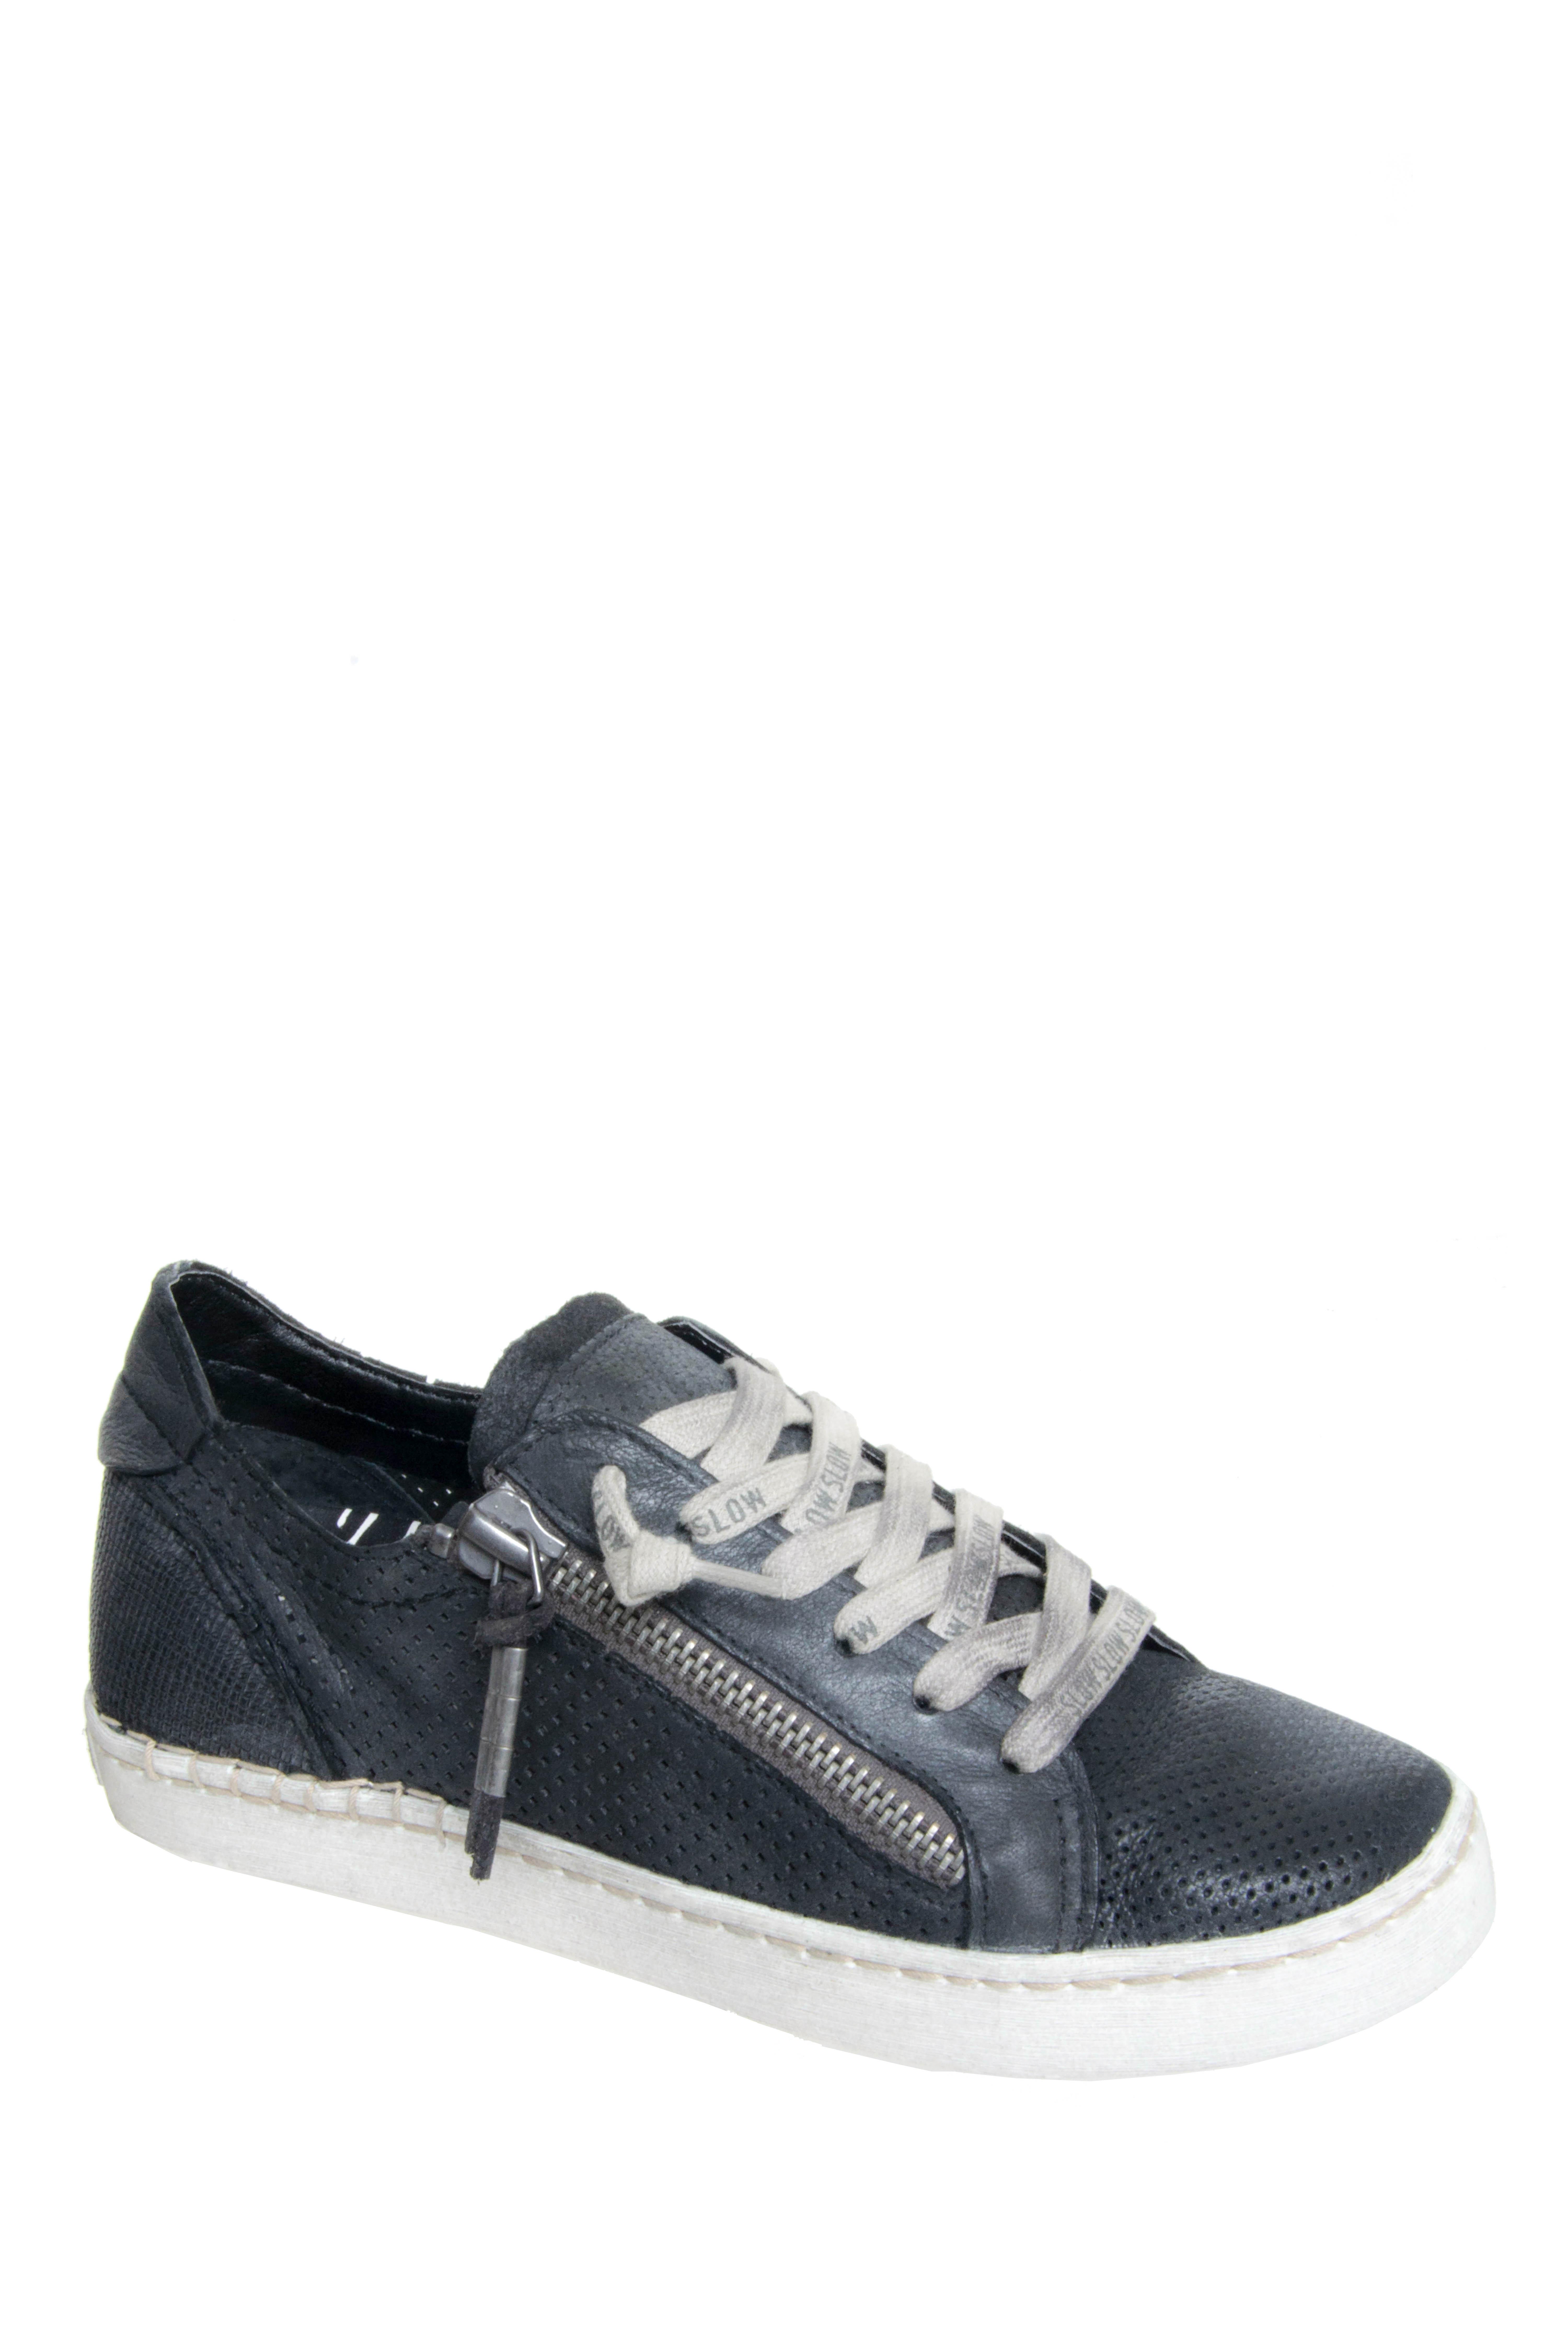 Dolce Vita Zombie Low Top Sneakers - Black Nubuck